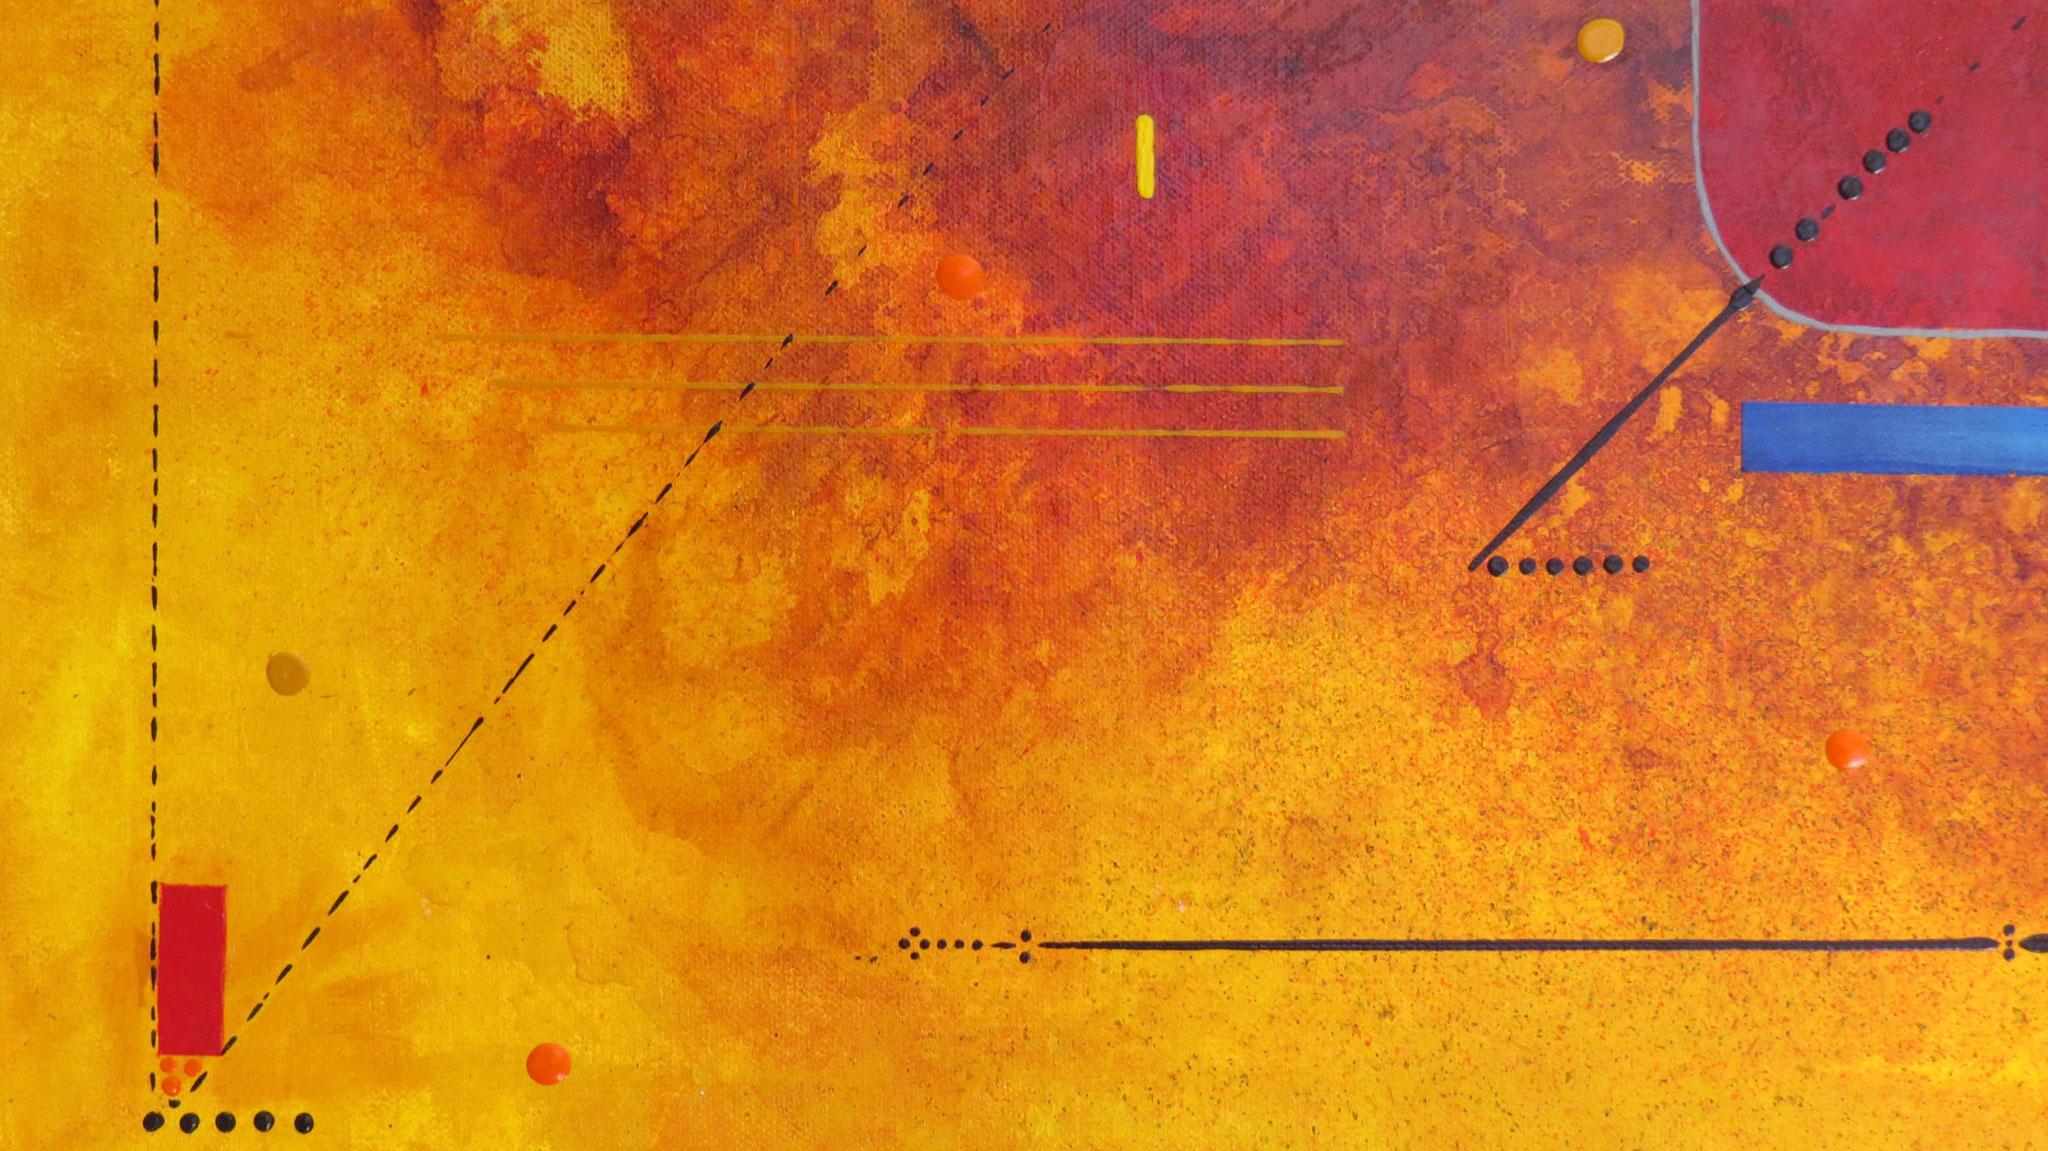 delta - zoom3 - DALUZ GALEGO - peinture abstraite